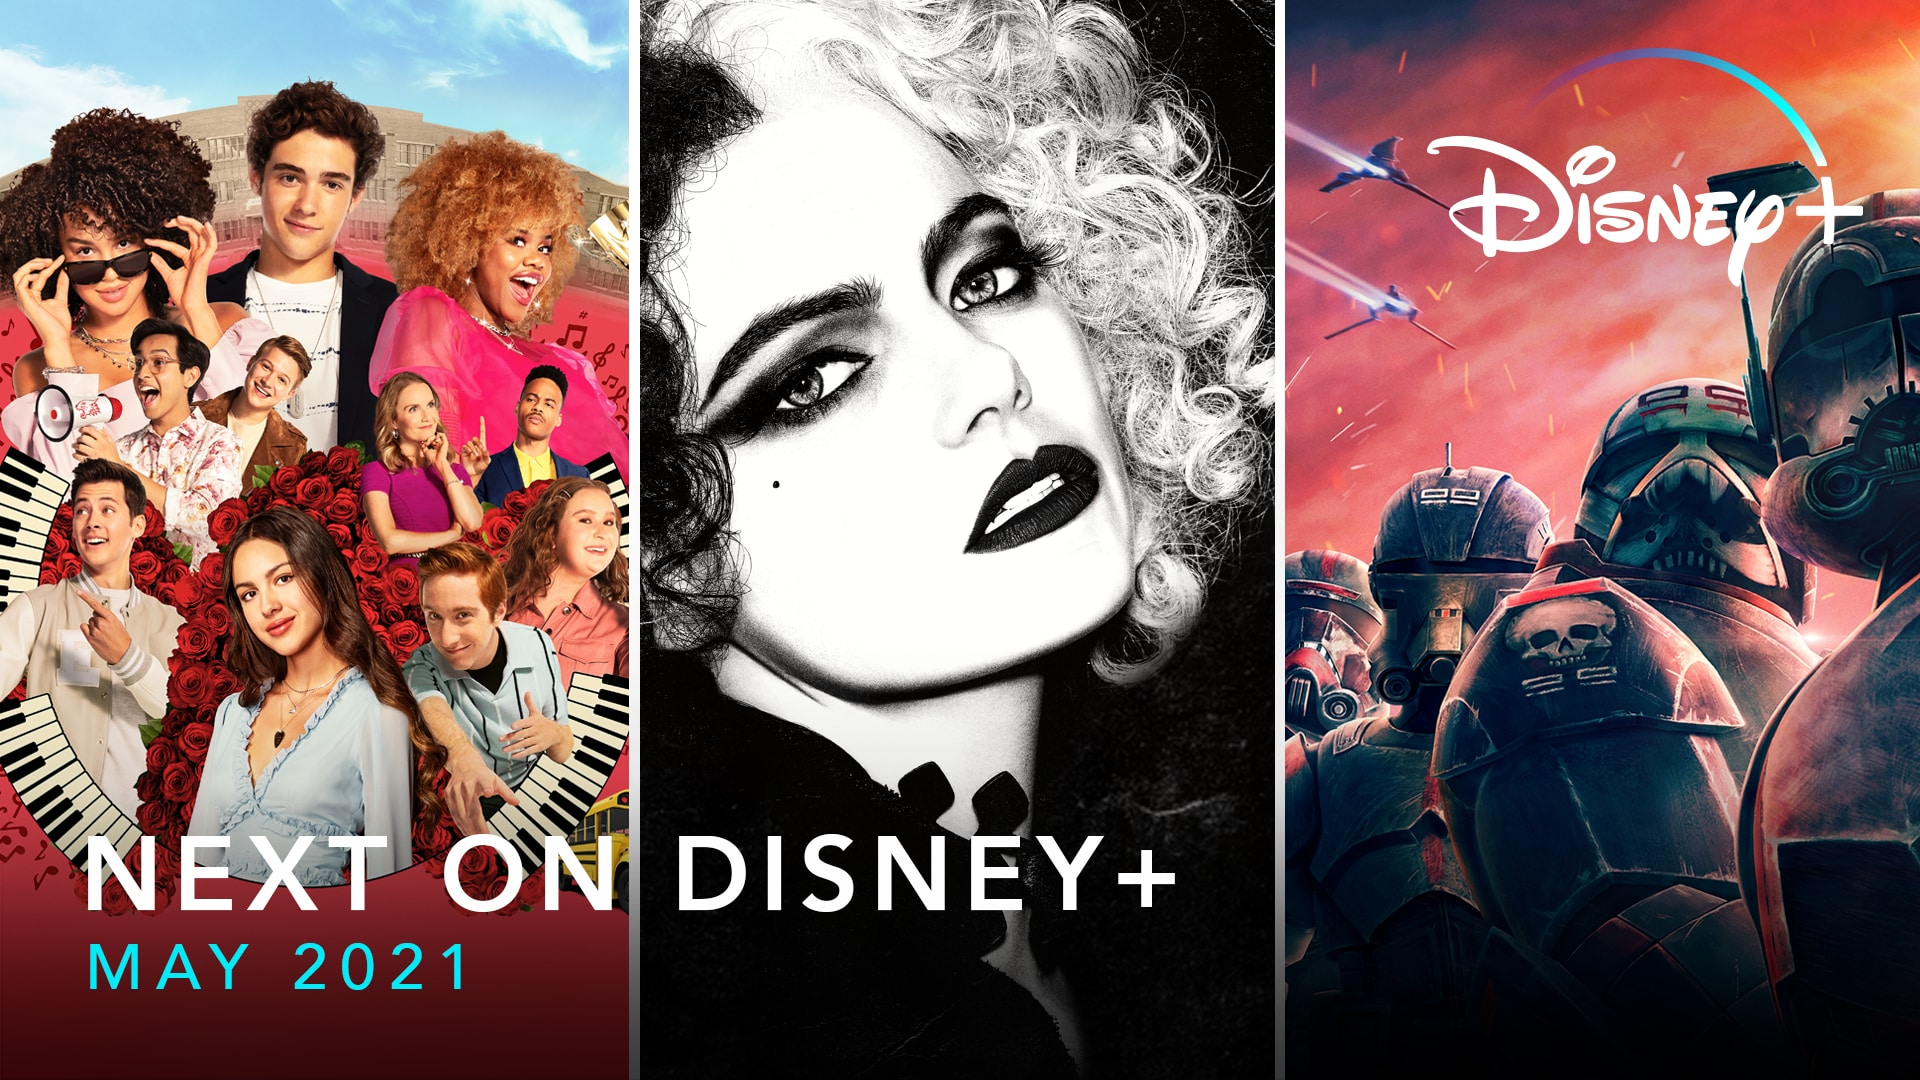 Next On Disney+ - May 2021| Disney+